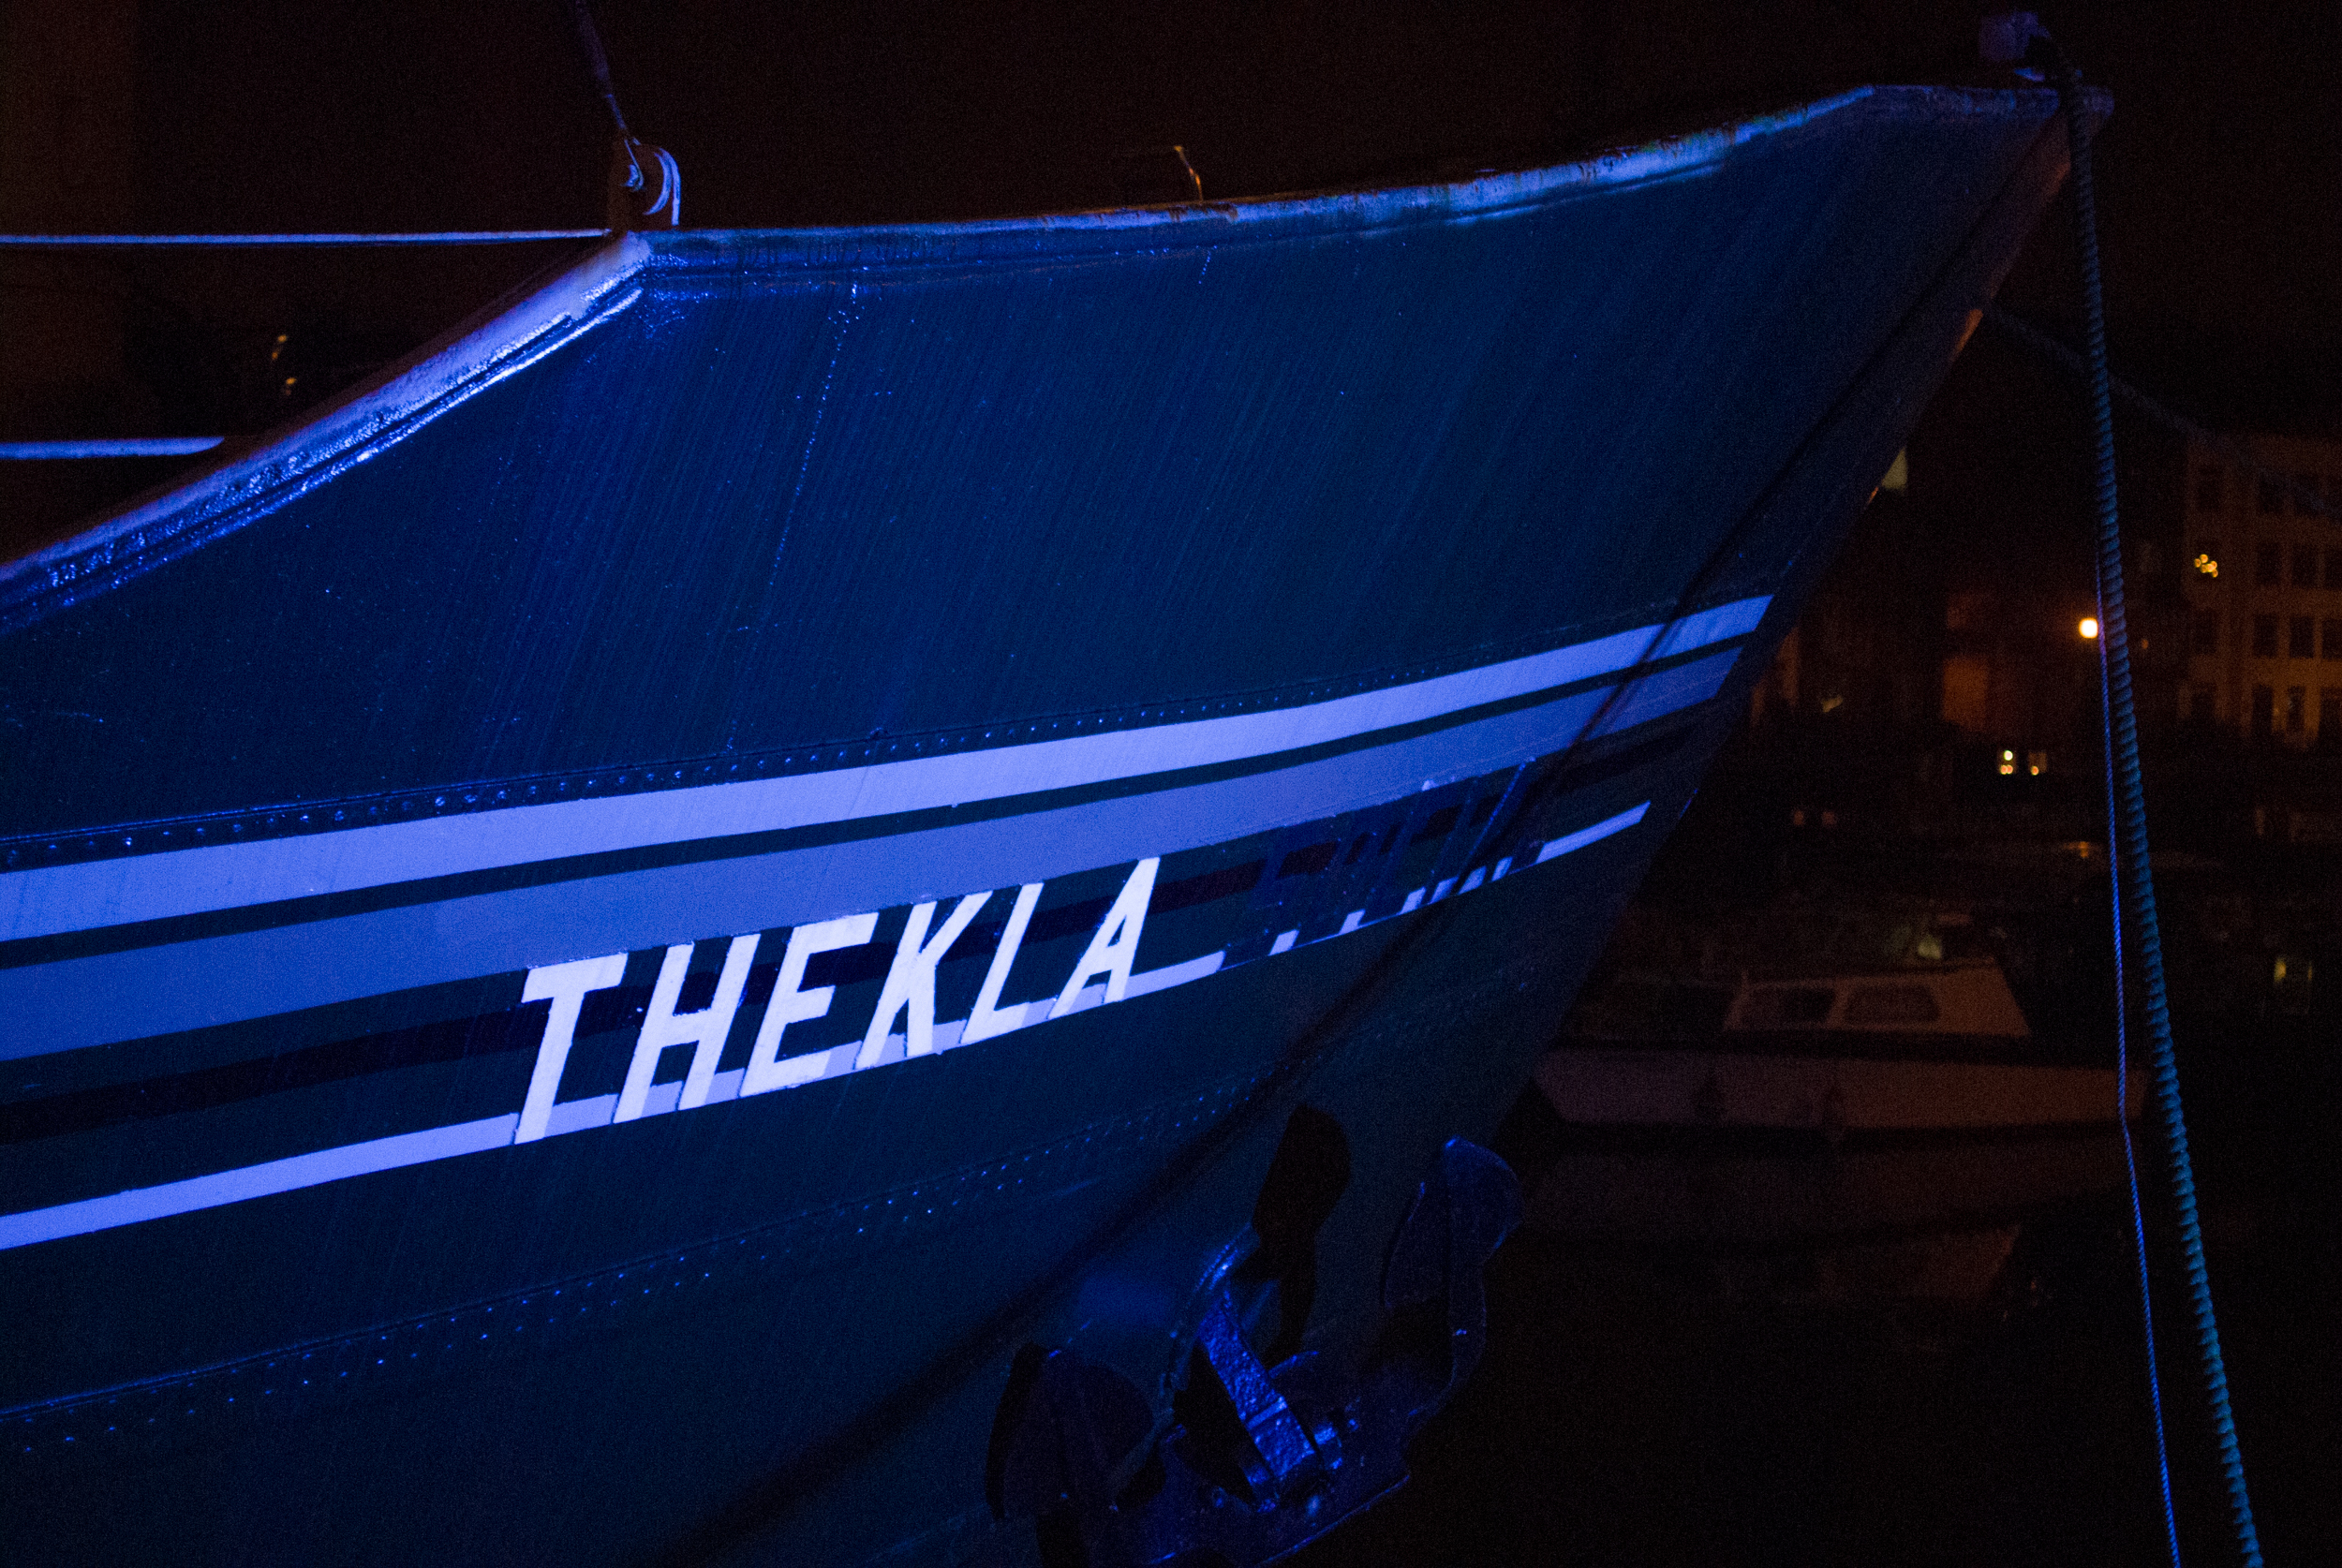 Thekla Boat Club